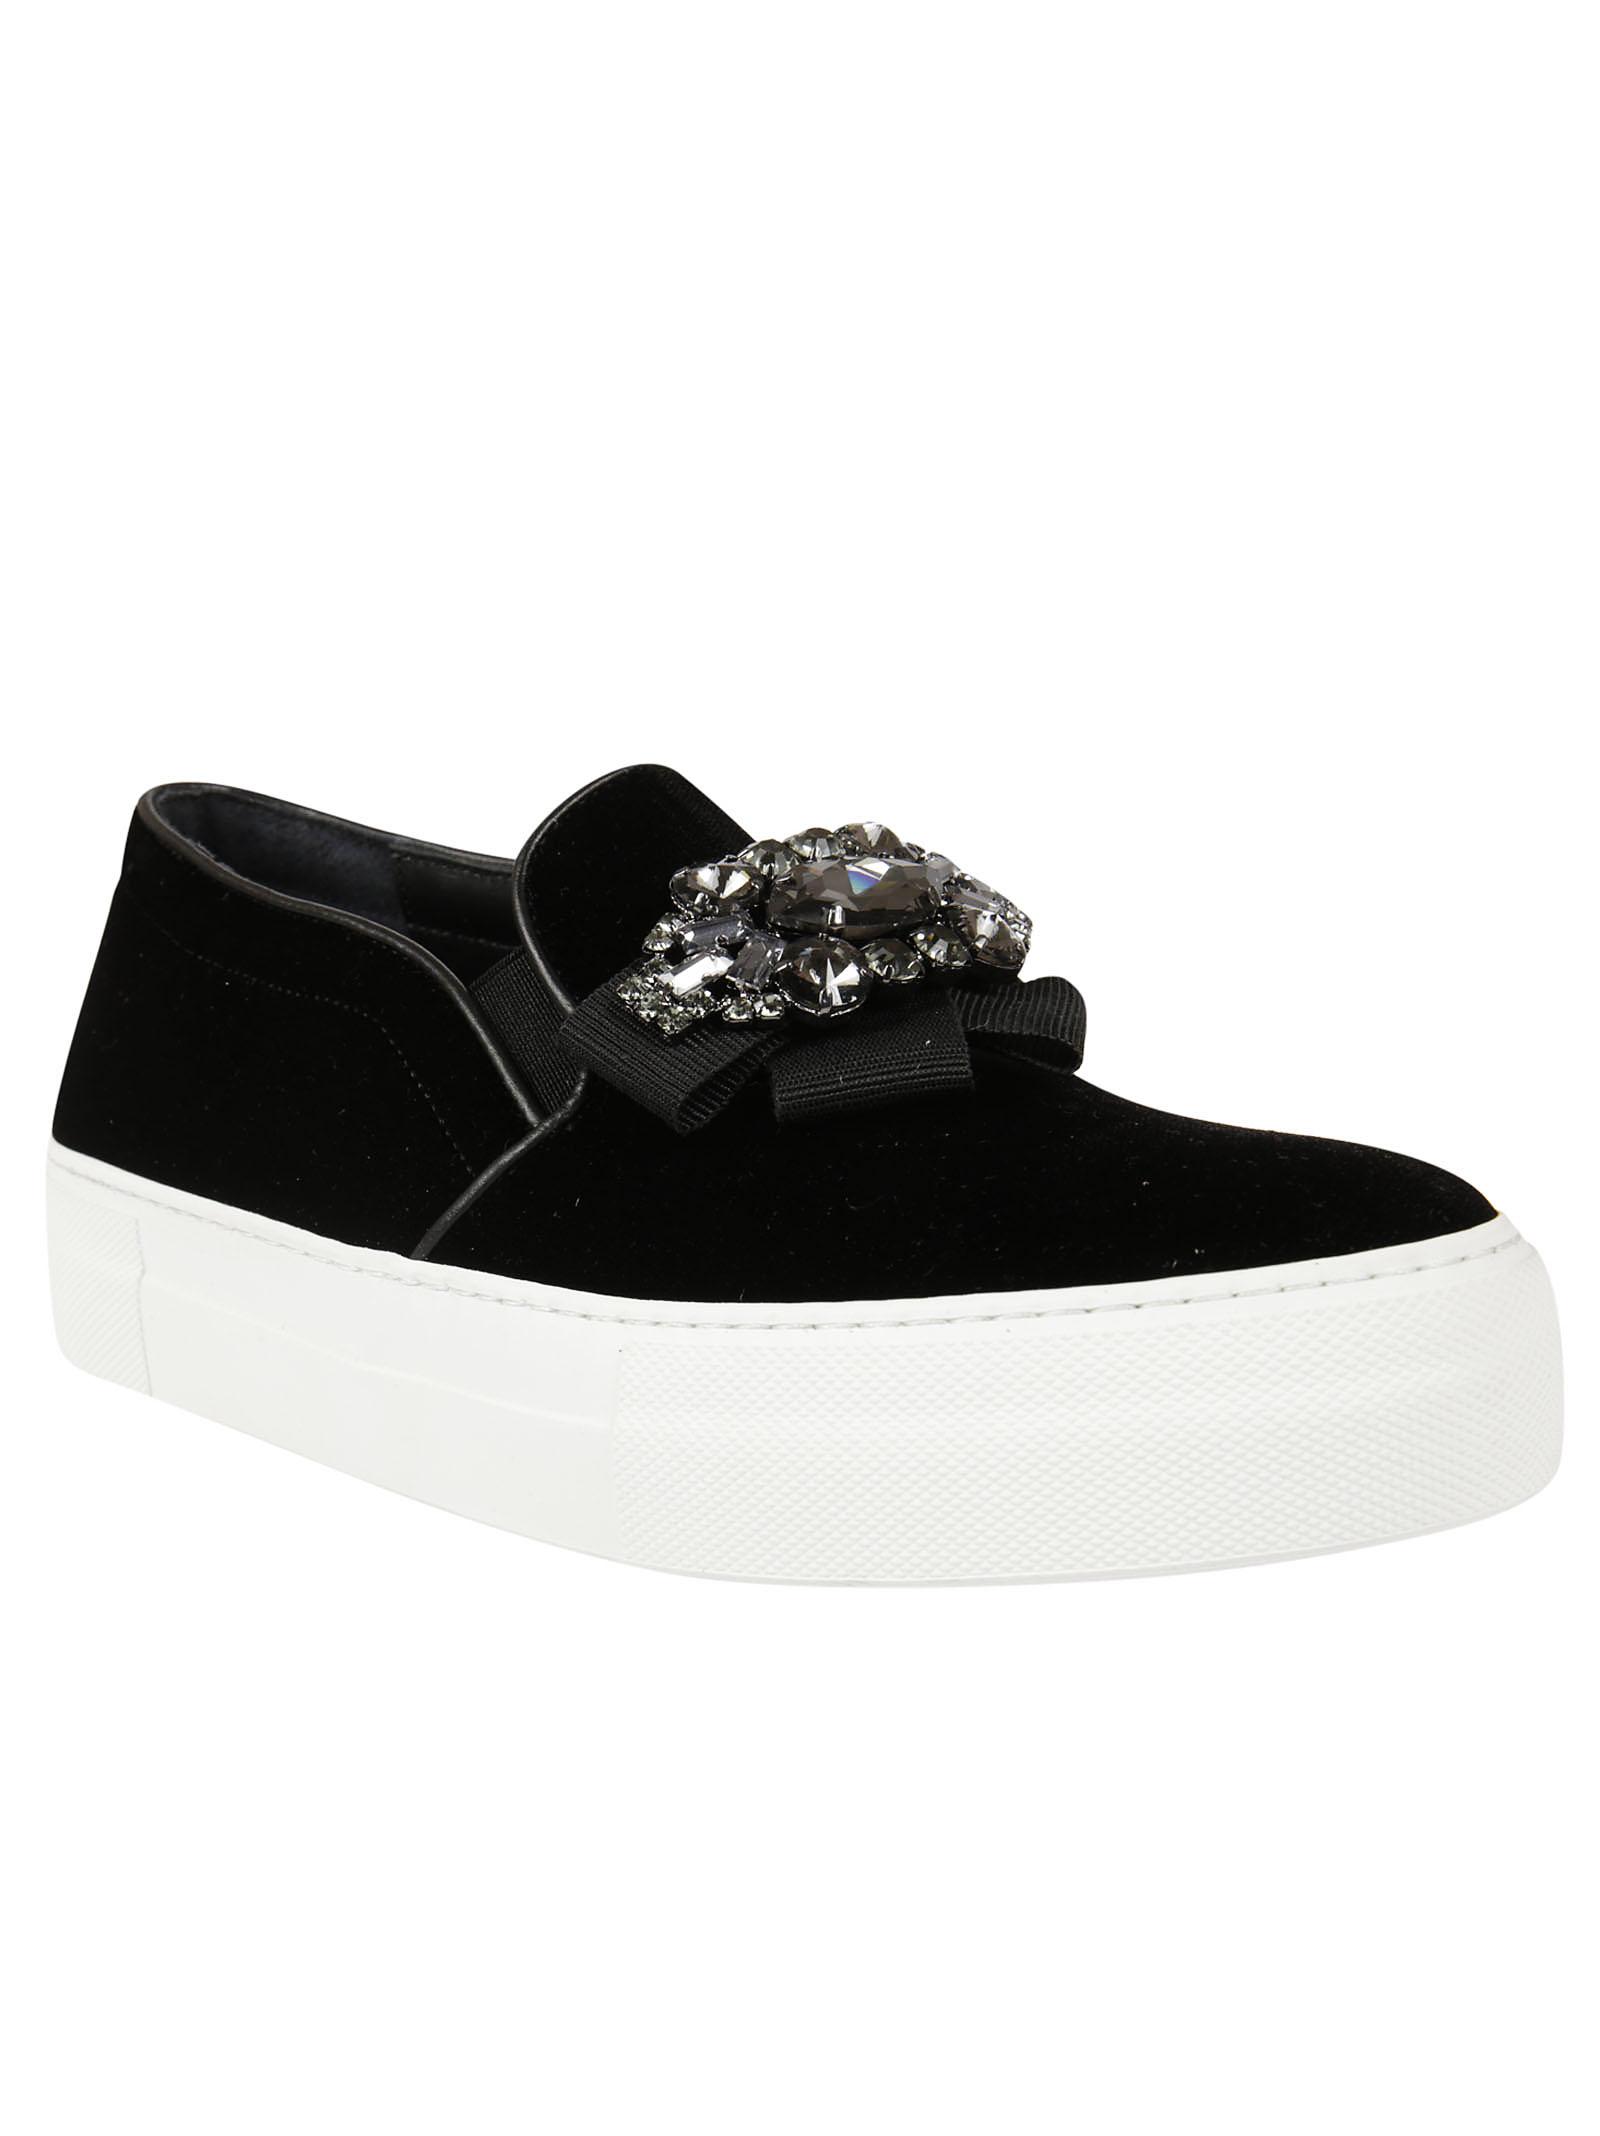 Anna F. Anna F Diamond Embellished Slip-On Sneakers